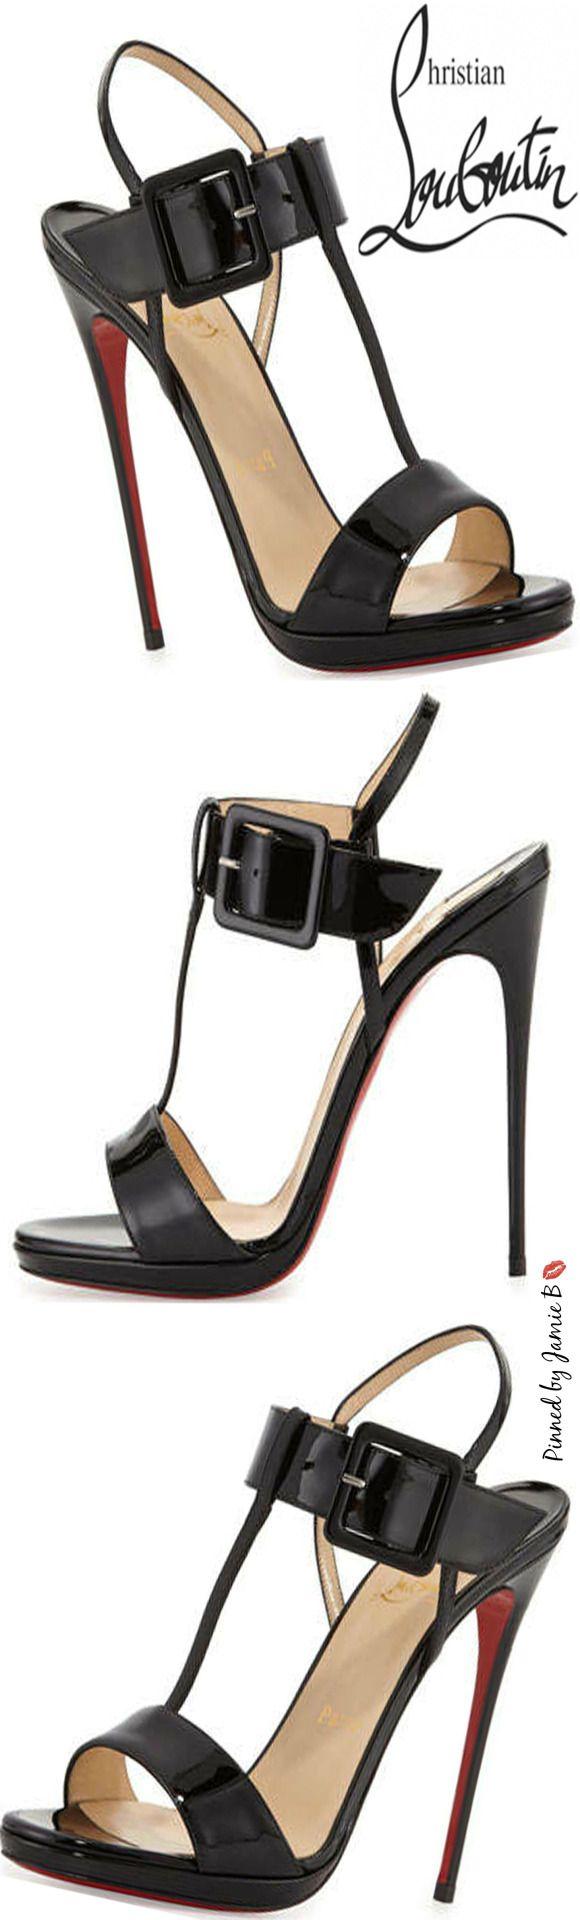 blessedshoegirl2:  Christian Louboutin  Beltega Patent Red Sole Sandal   Jamie B